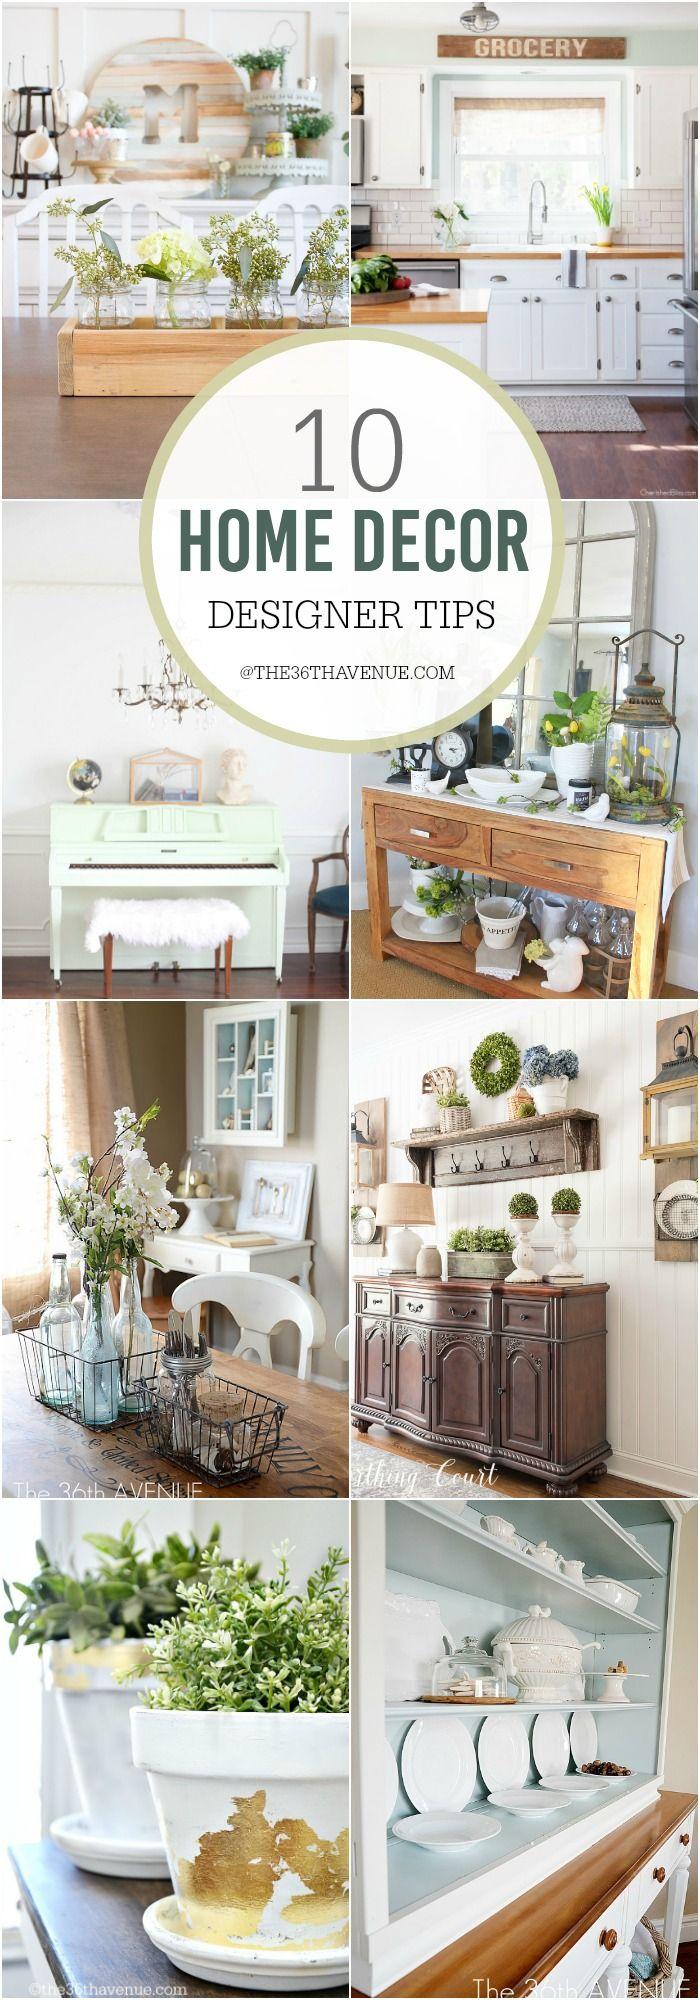 Home Decor Design Tips | Deko